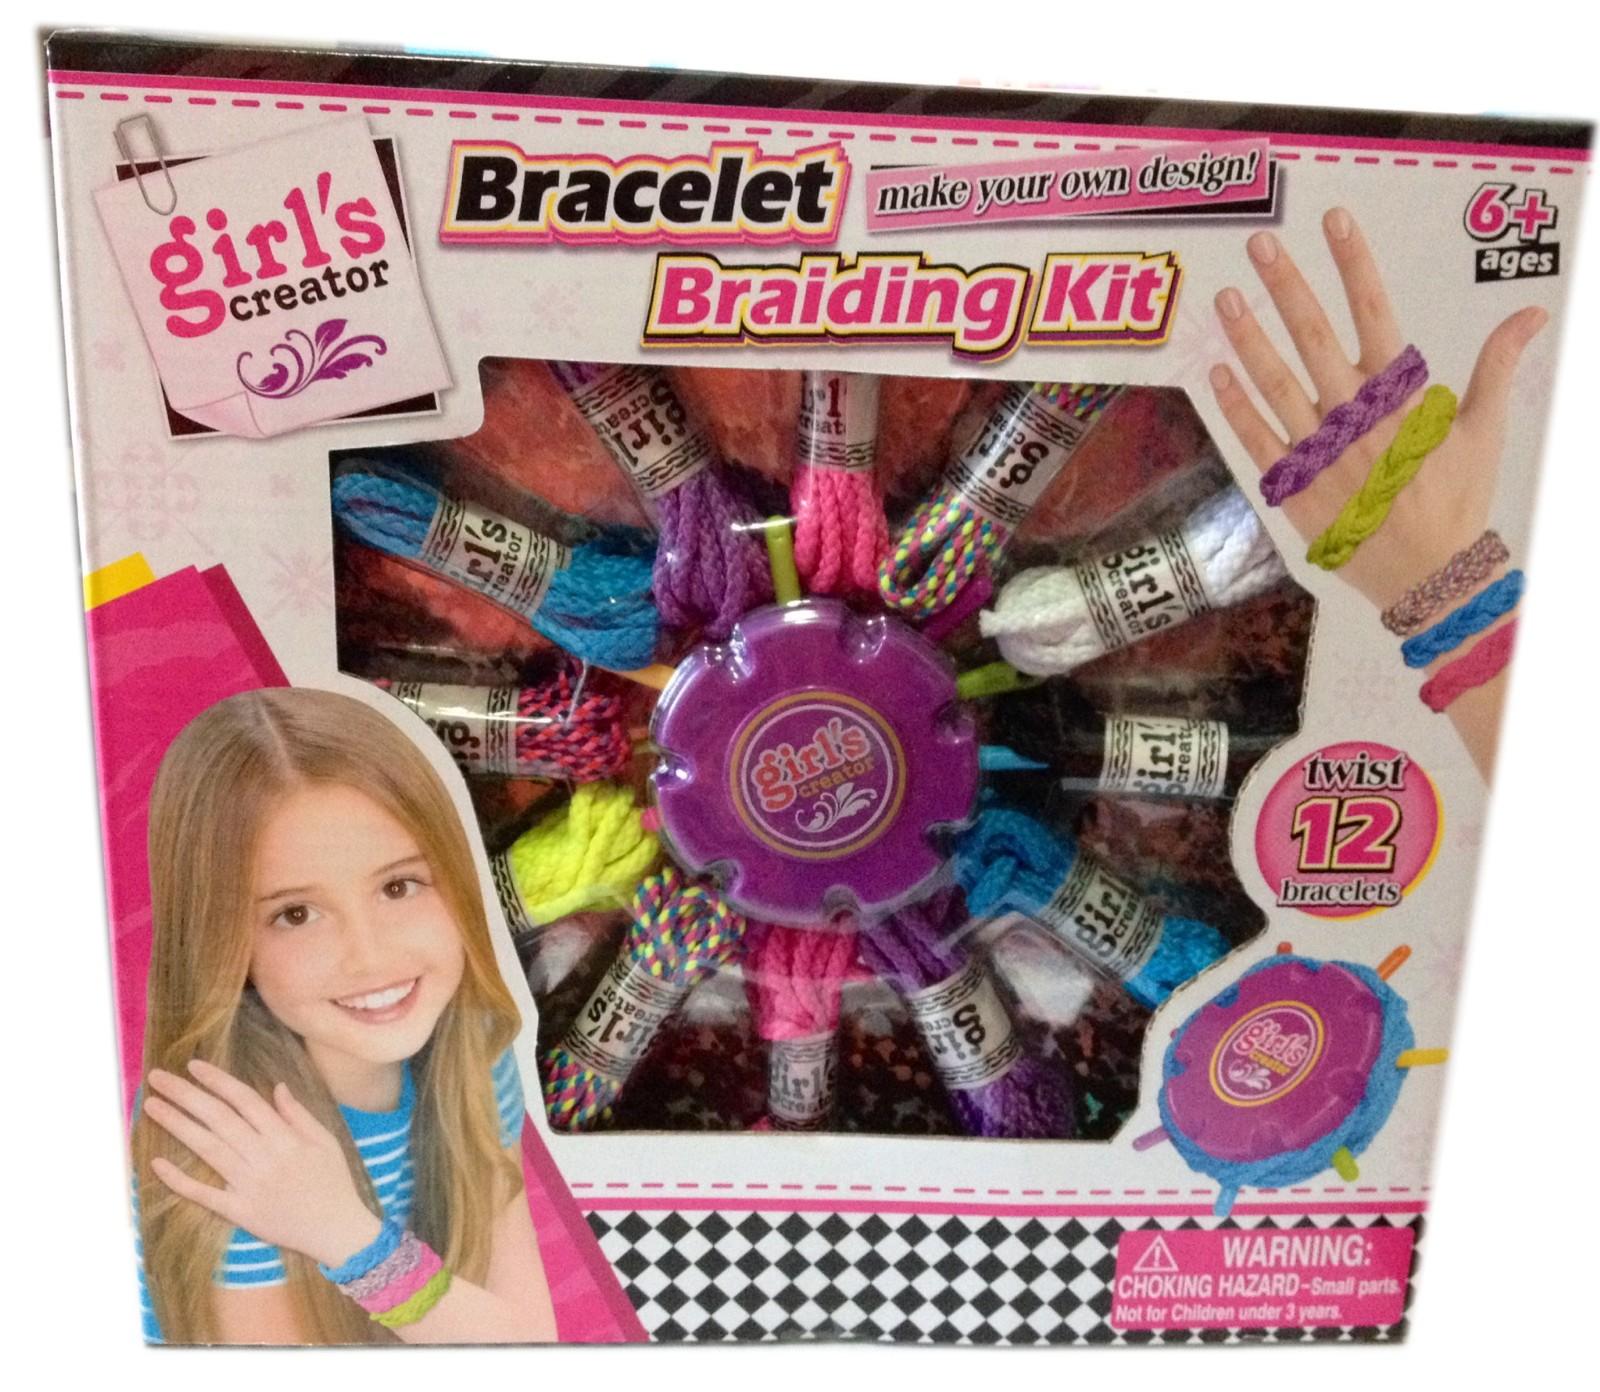 Girls creator bracelet braiding kit